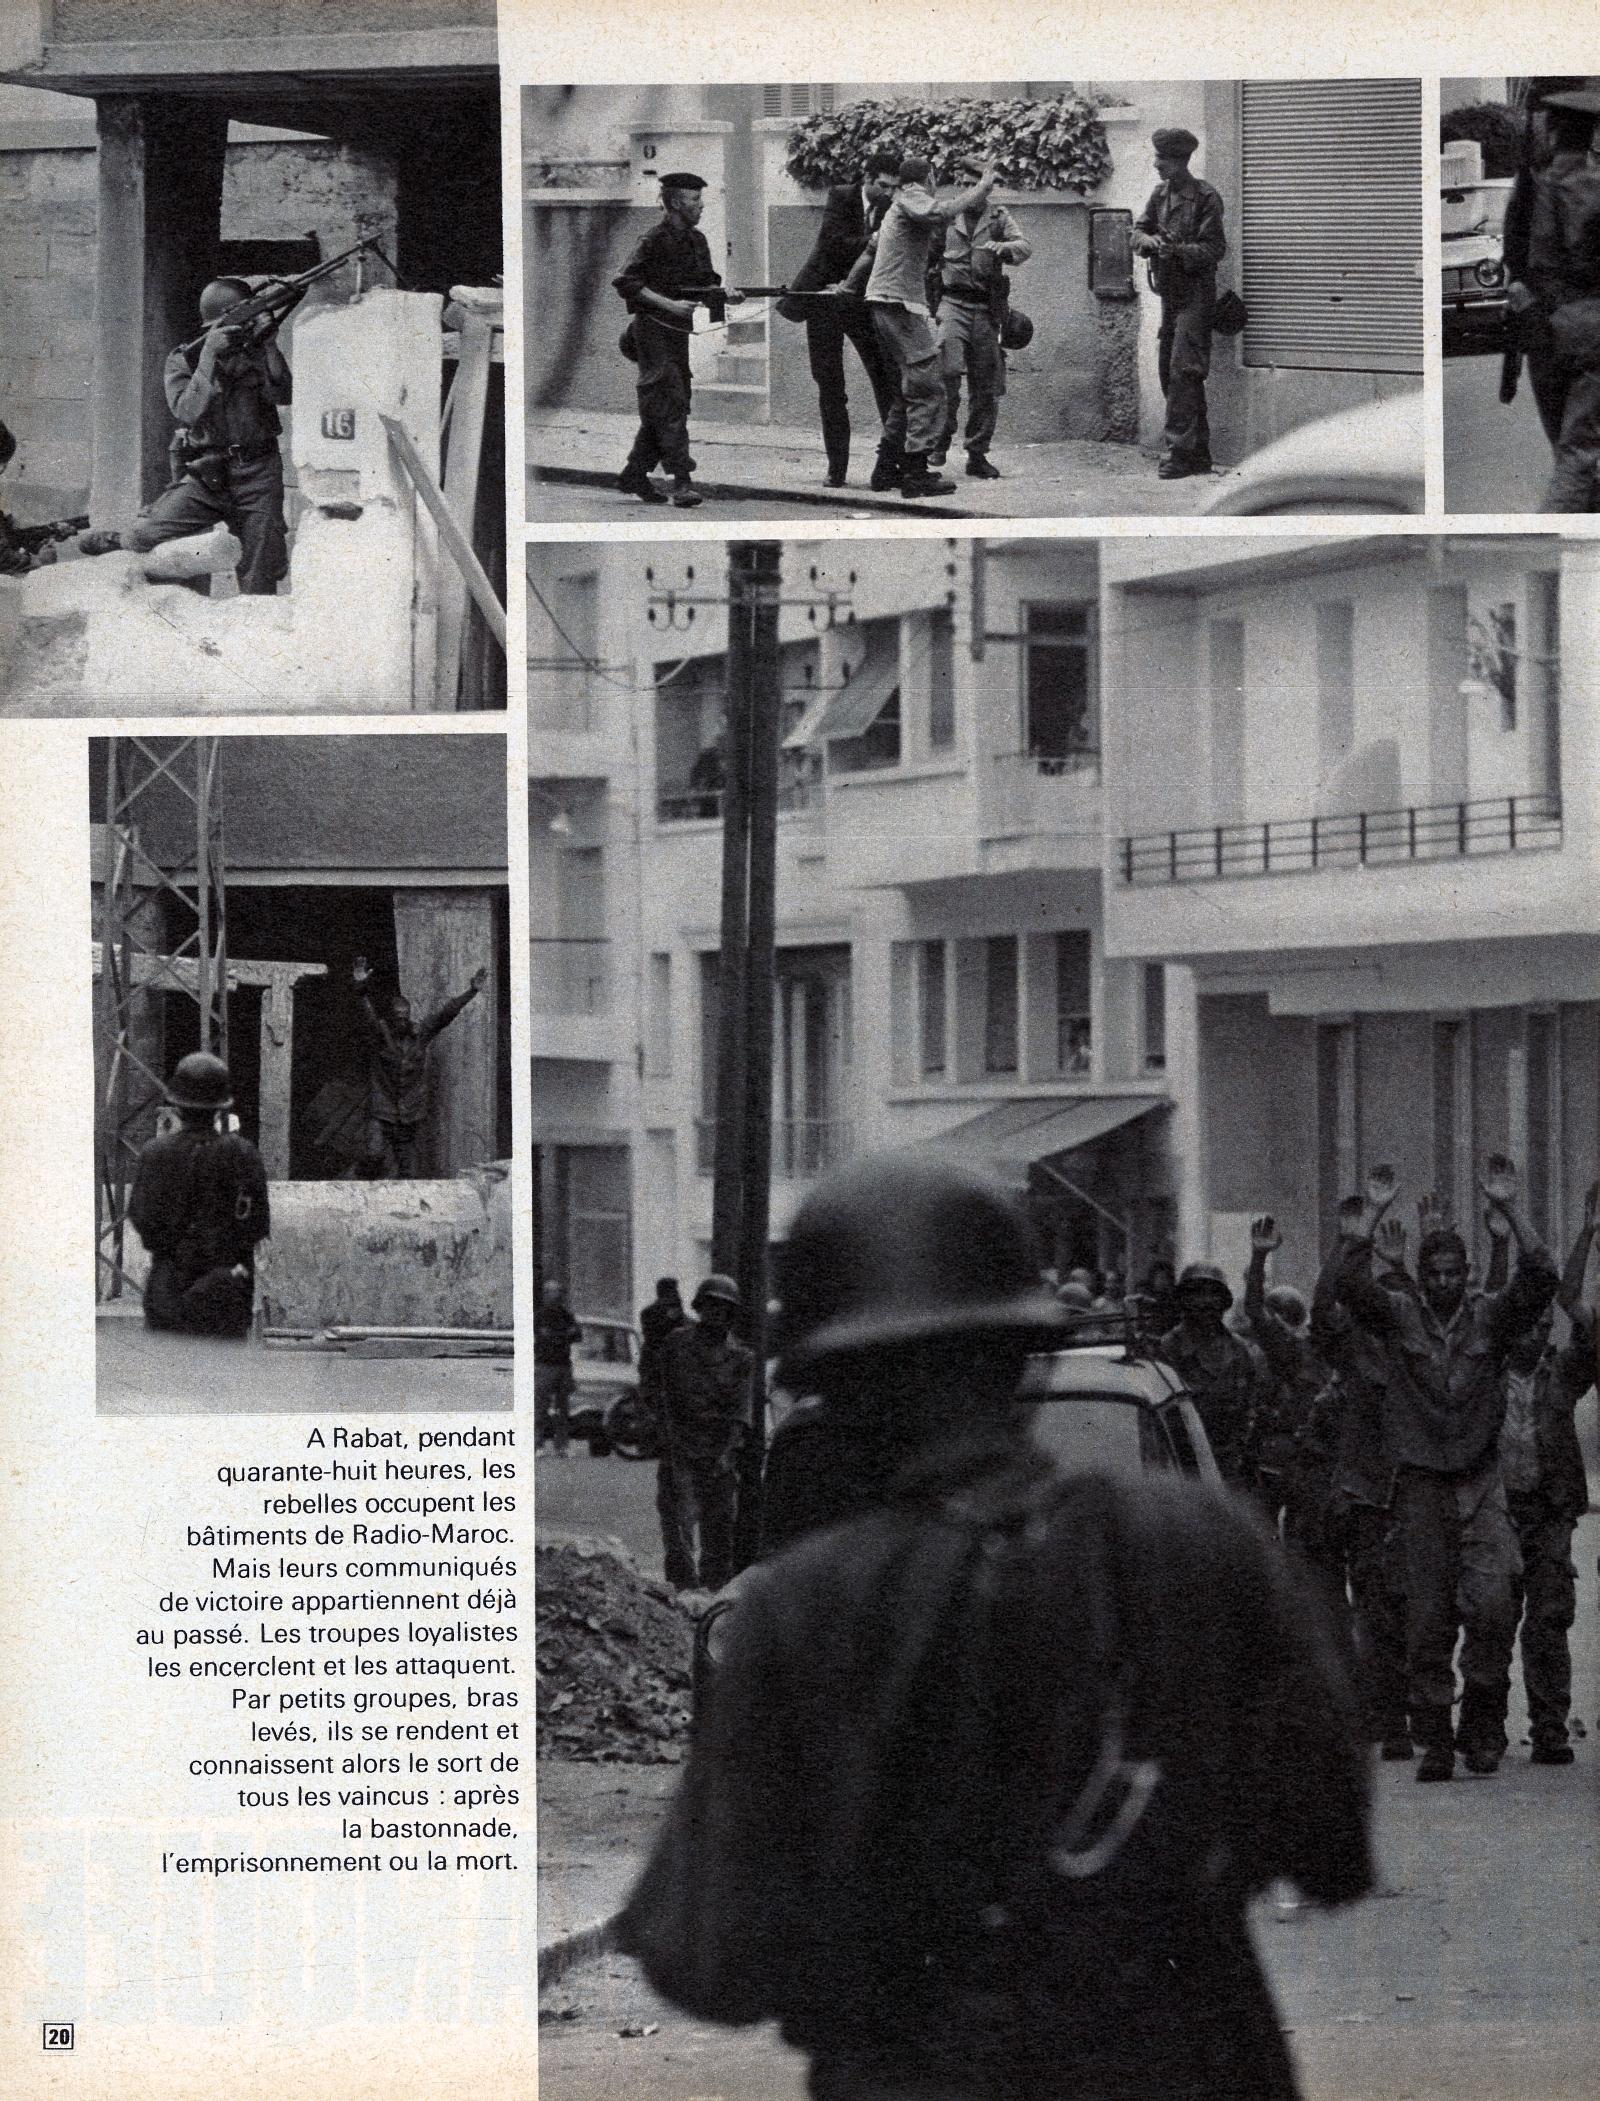 Tentative de coup d'État à Rabat et Skhirate le 10 juillet 1971  48695821132_094ba6e6ab_o